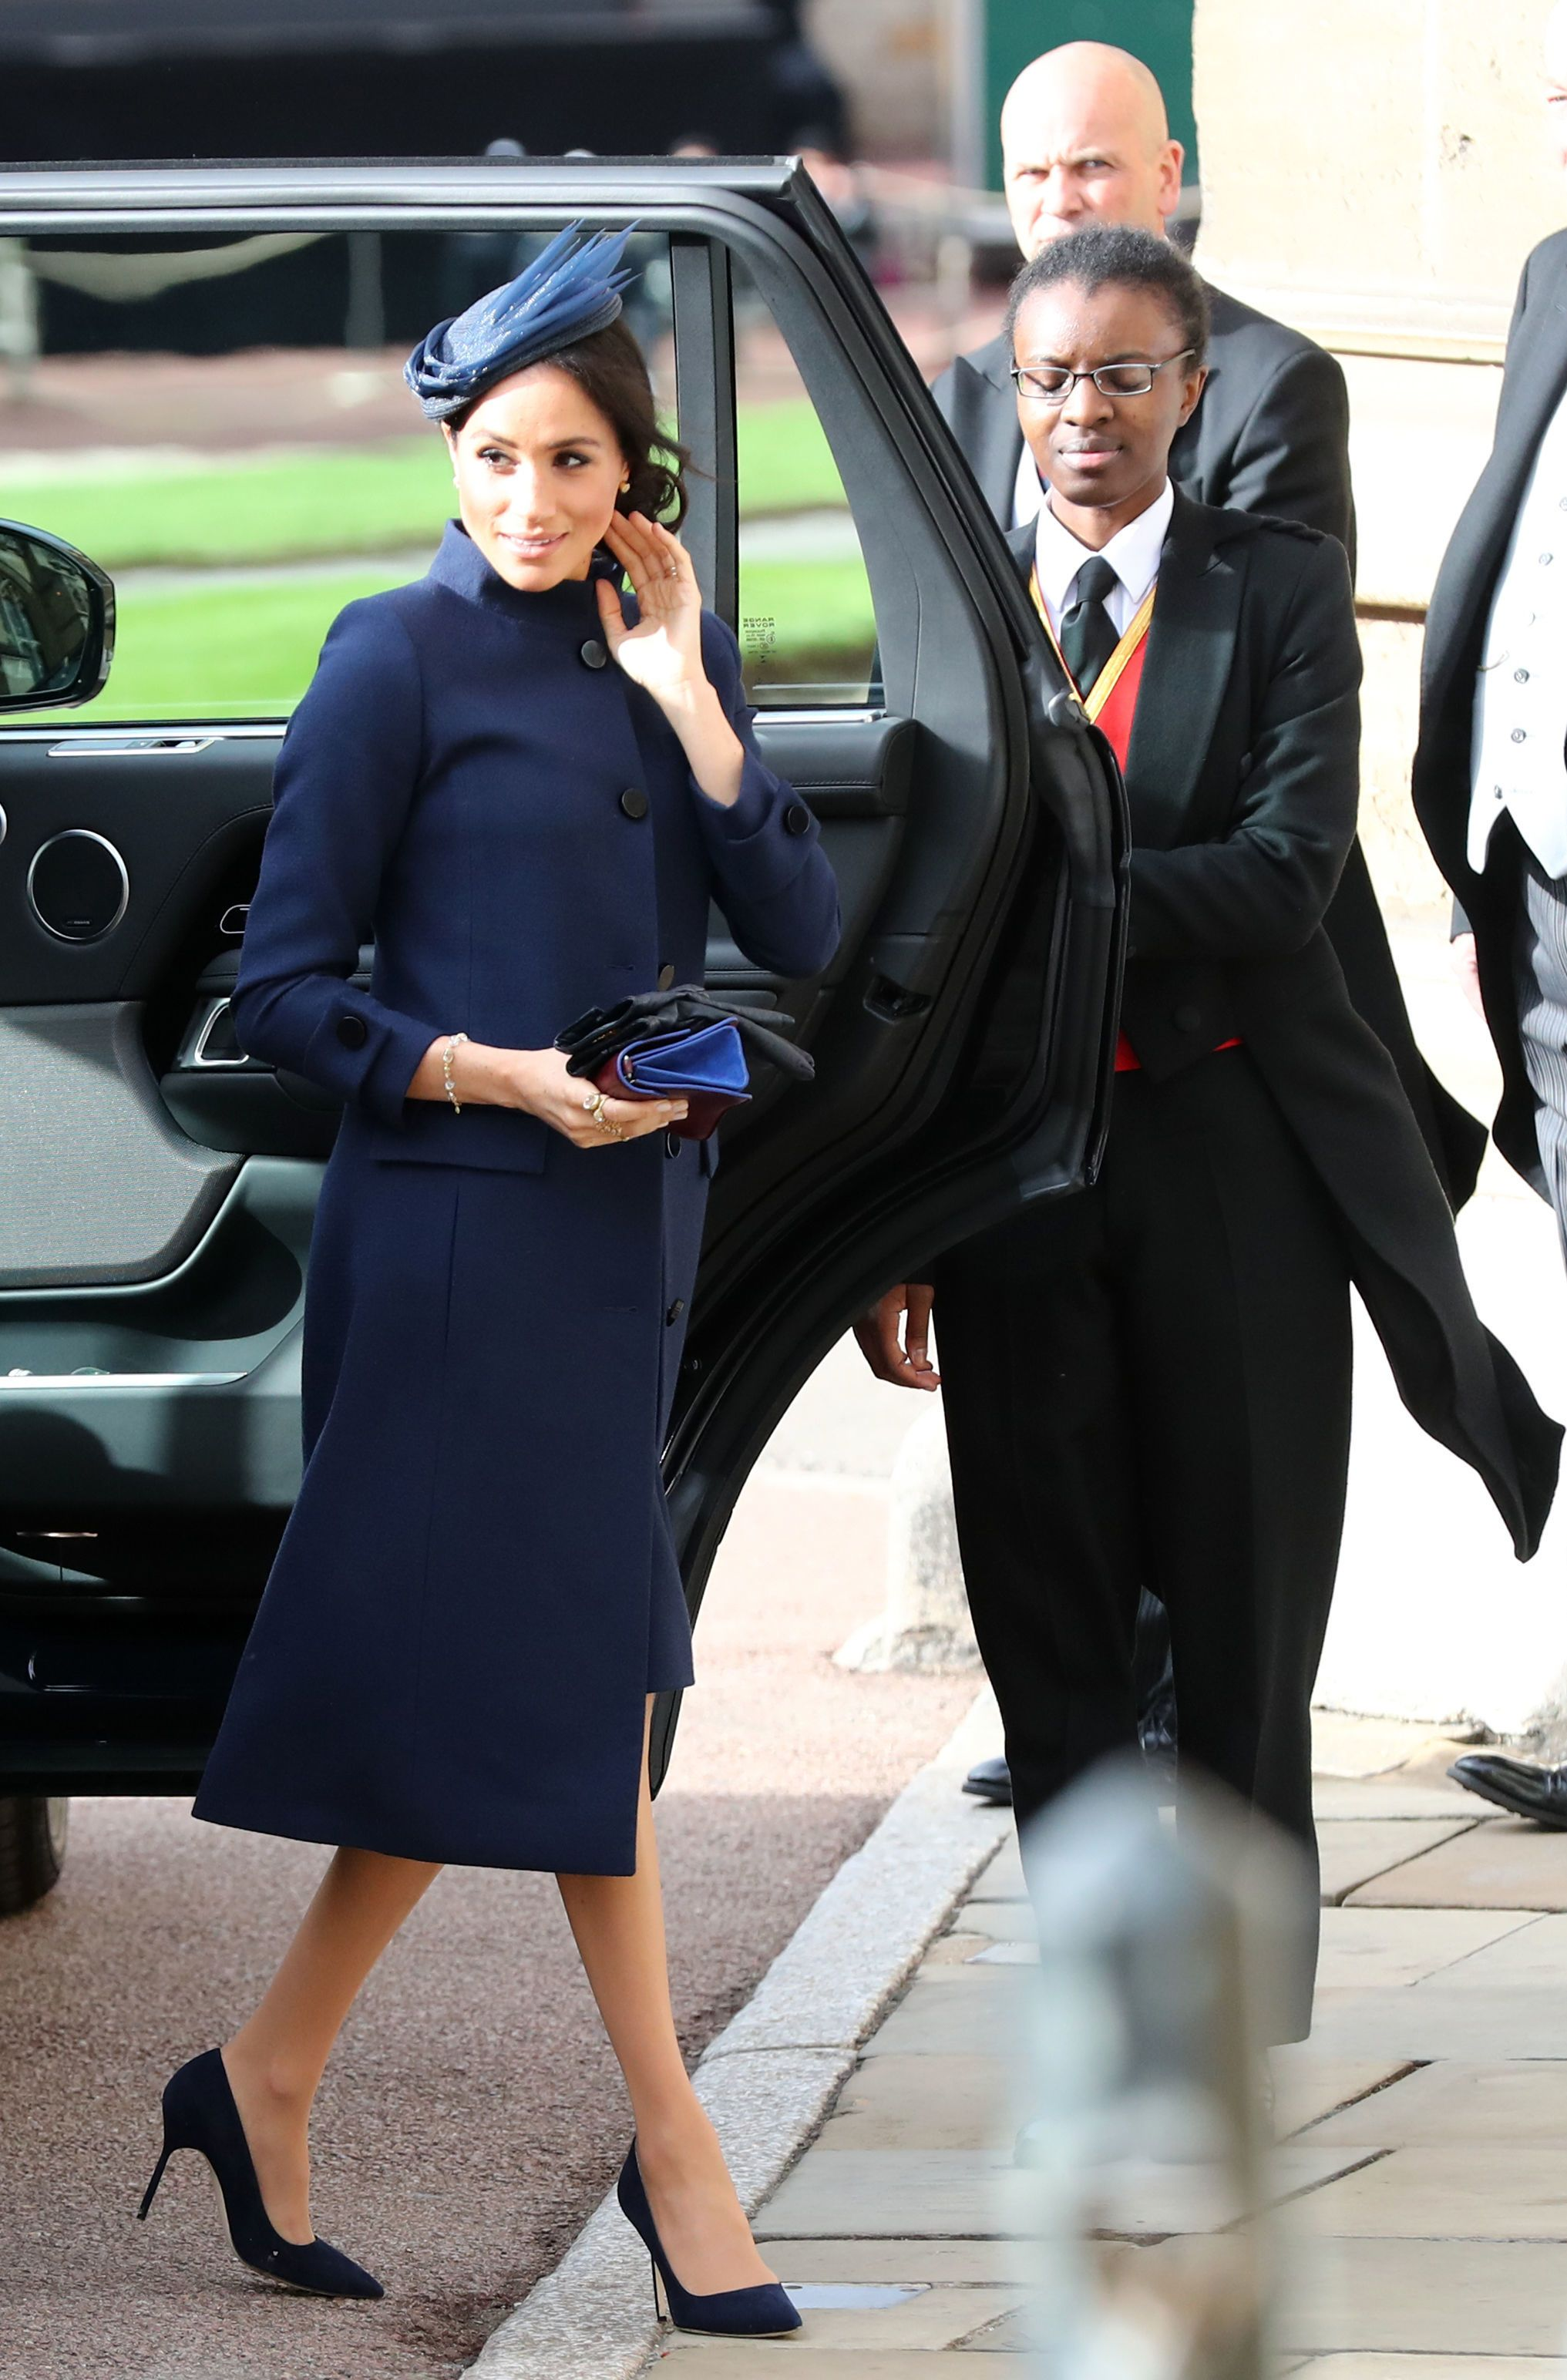 1b74caa6f037 Meghan Markle Wears a Navy Givenchy Dress To Princess Eugenie and Jack  Brooksbank s Wedding